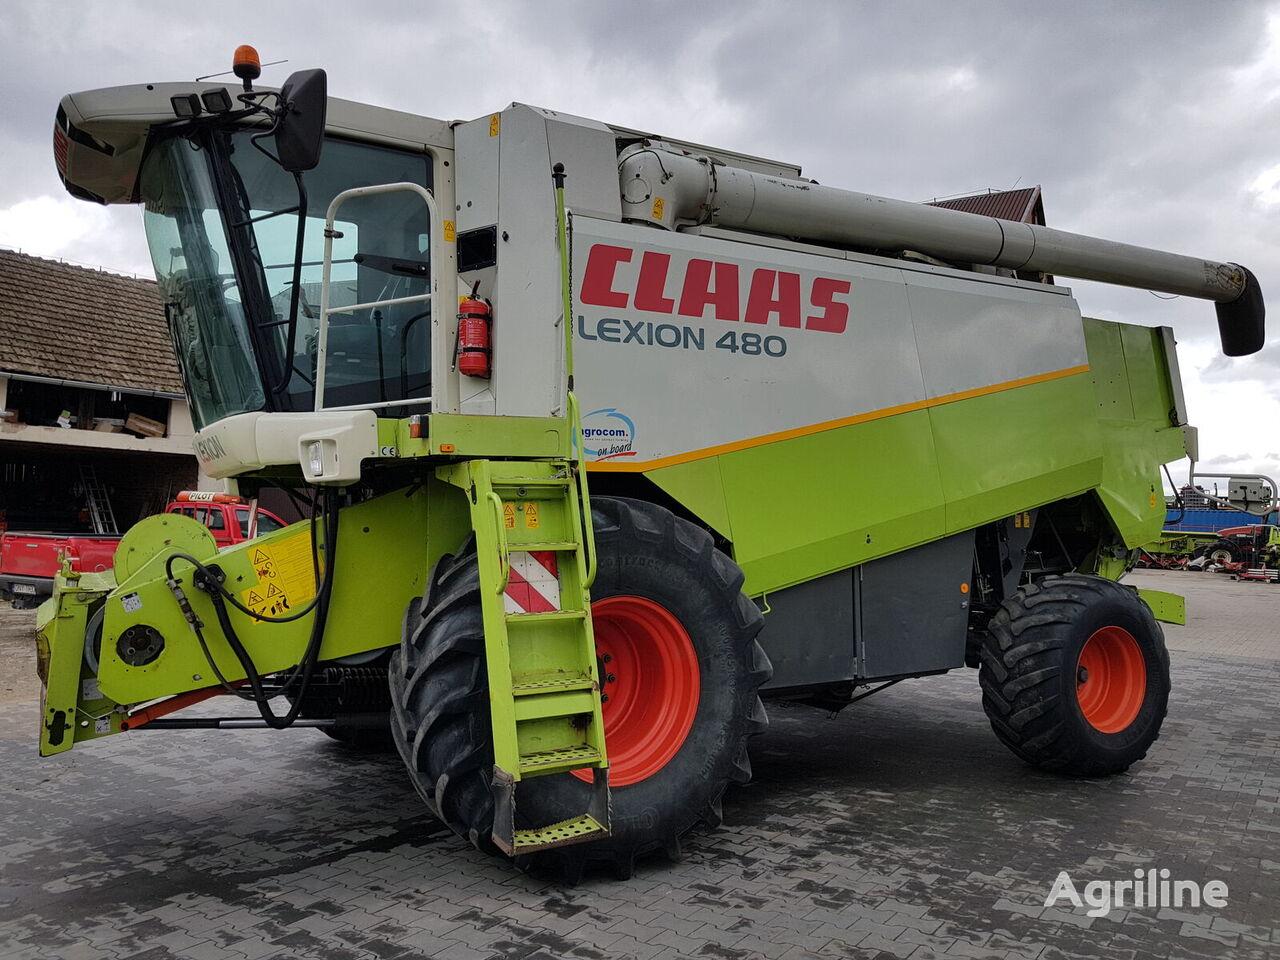 CLAAS Lexion 480 Agrocom on board grain harvester